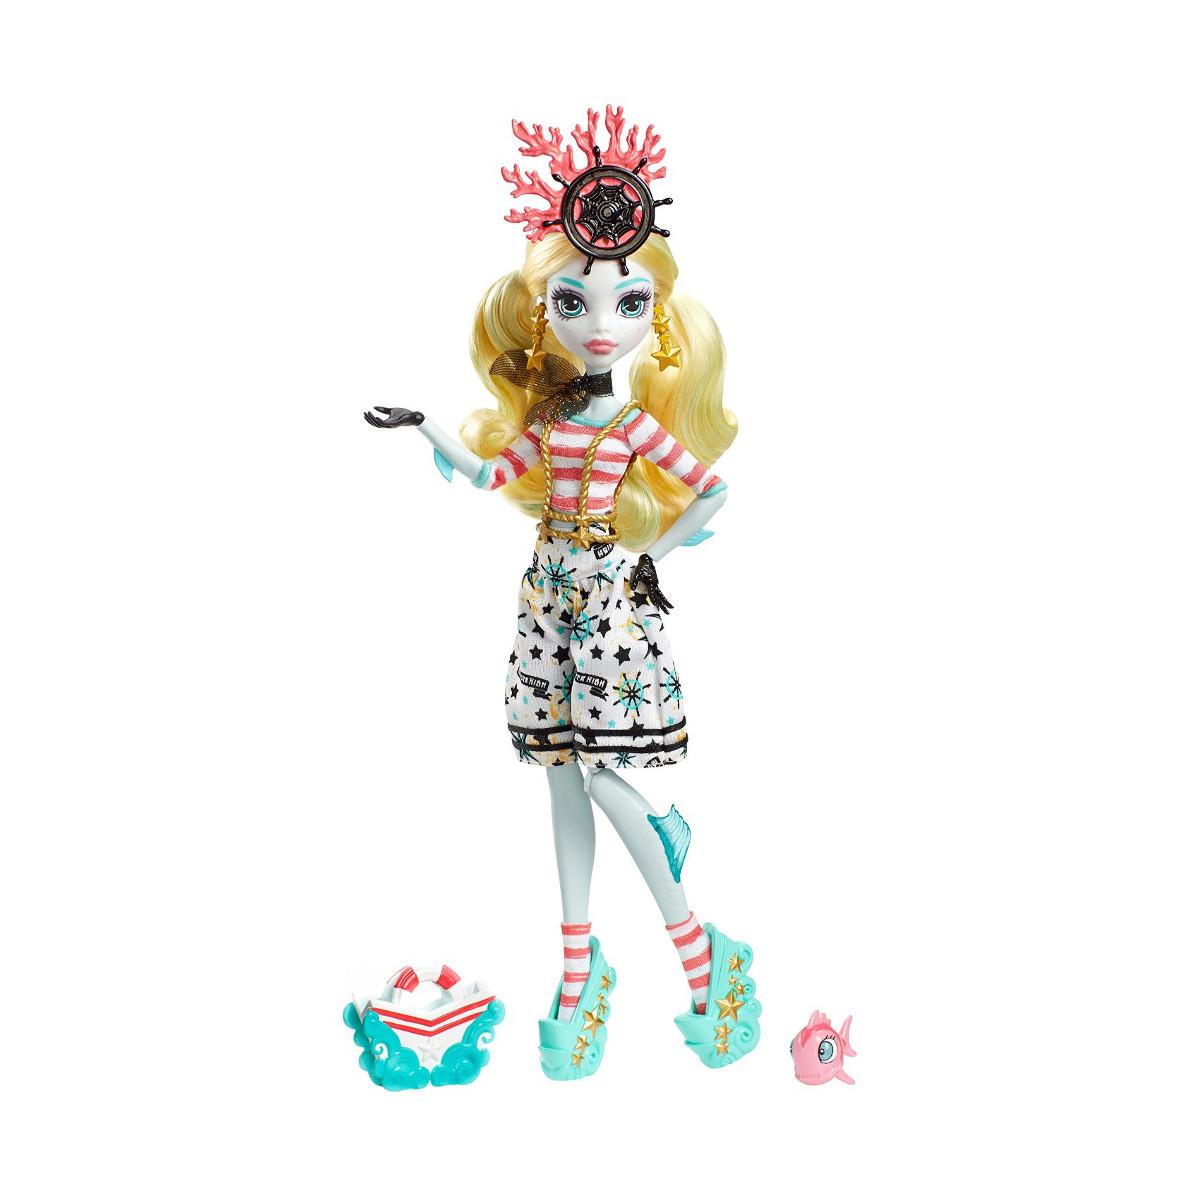 Mattel Monster High Кукла Лагуна Блю Lagoona Blue - Кораблекрушение